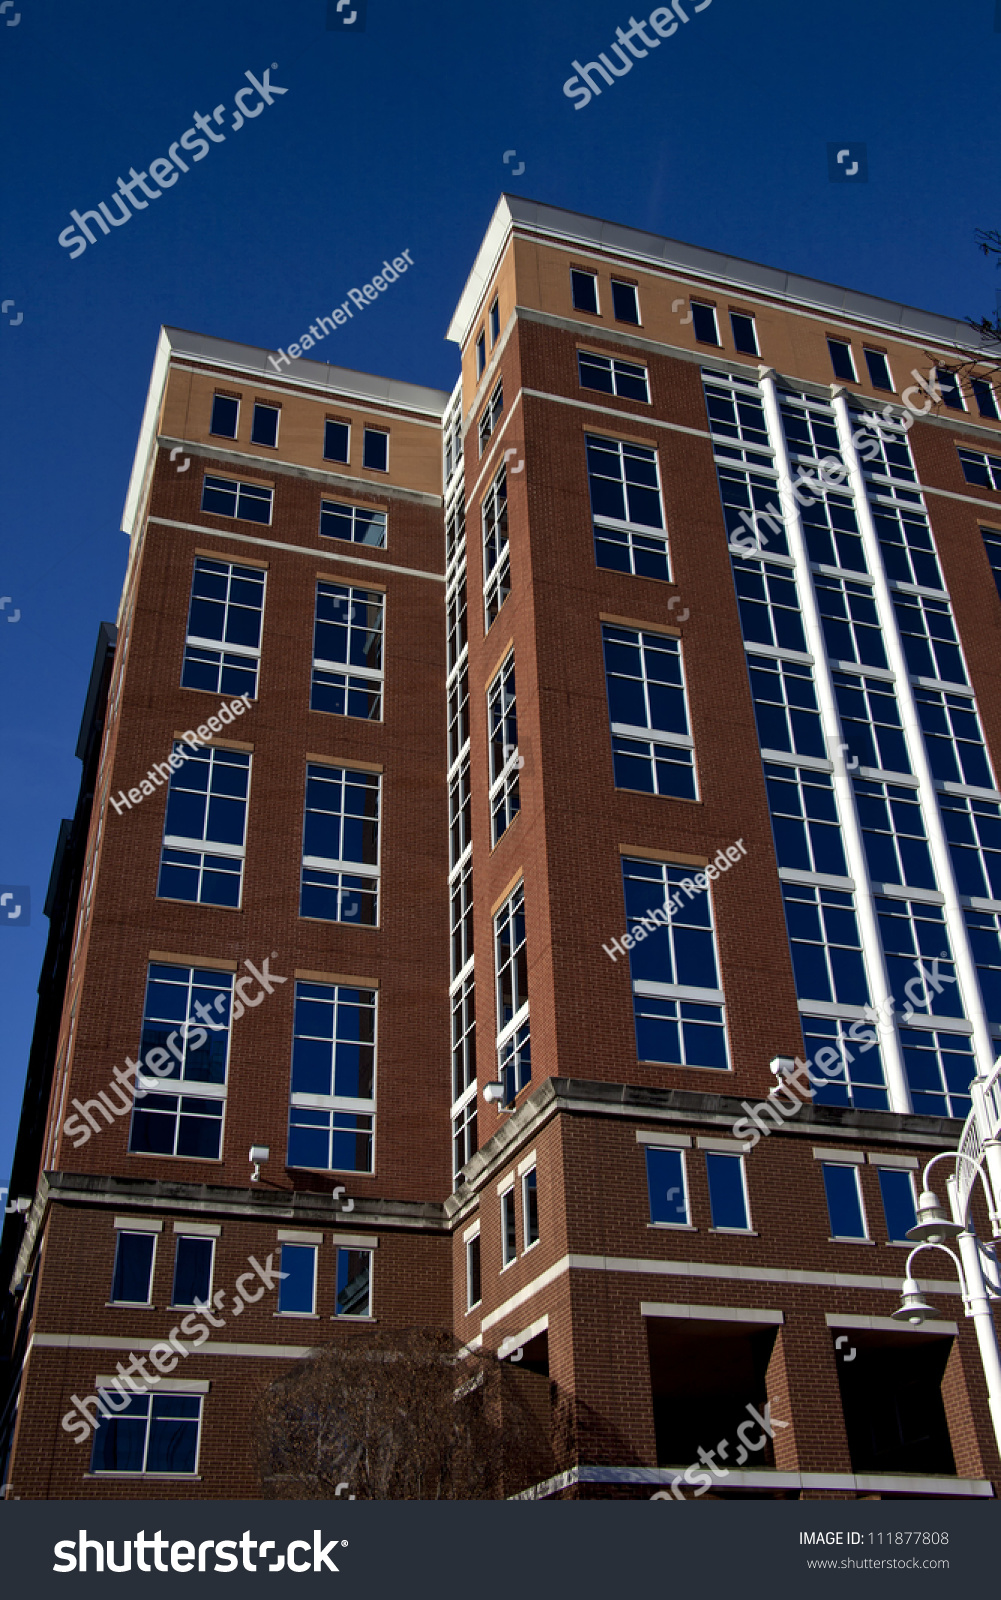 tall brick building blue tinted windows stock photo 111877808 shutterstock. Black Bedroom Furniture Sets. Home Design Ideas